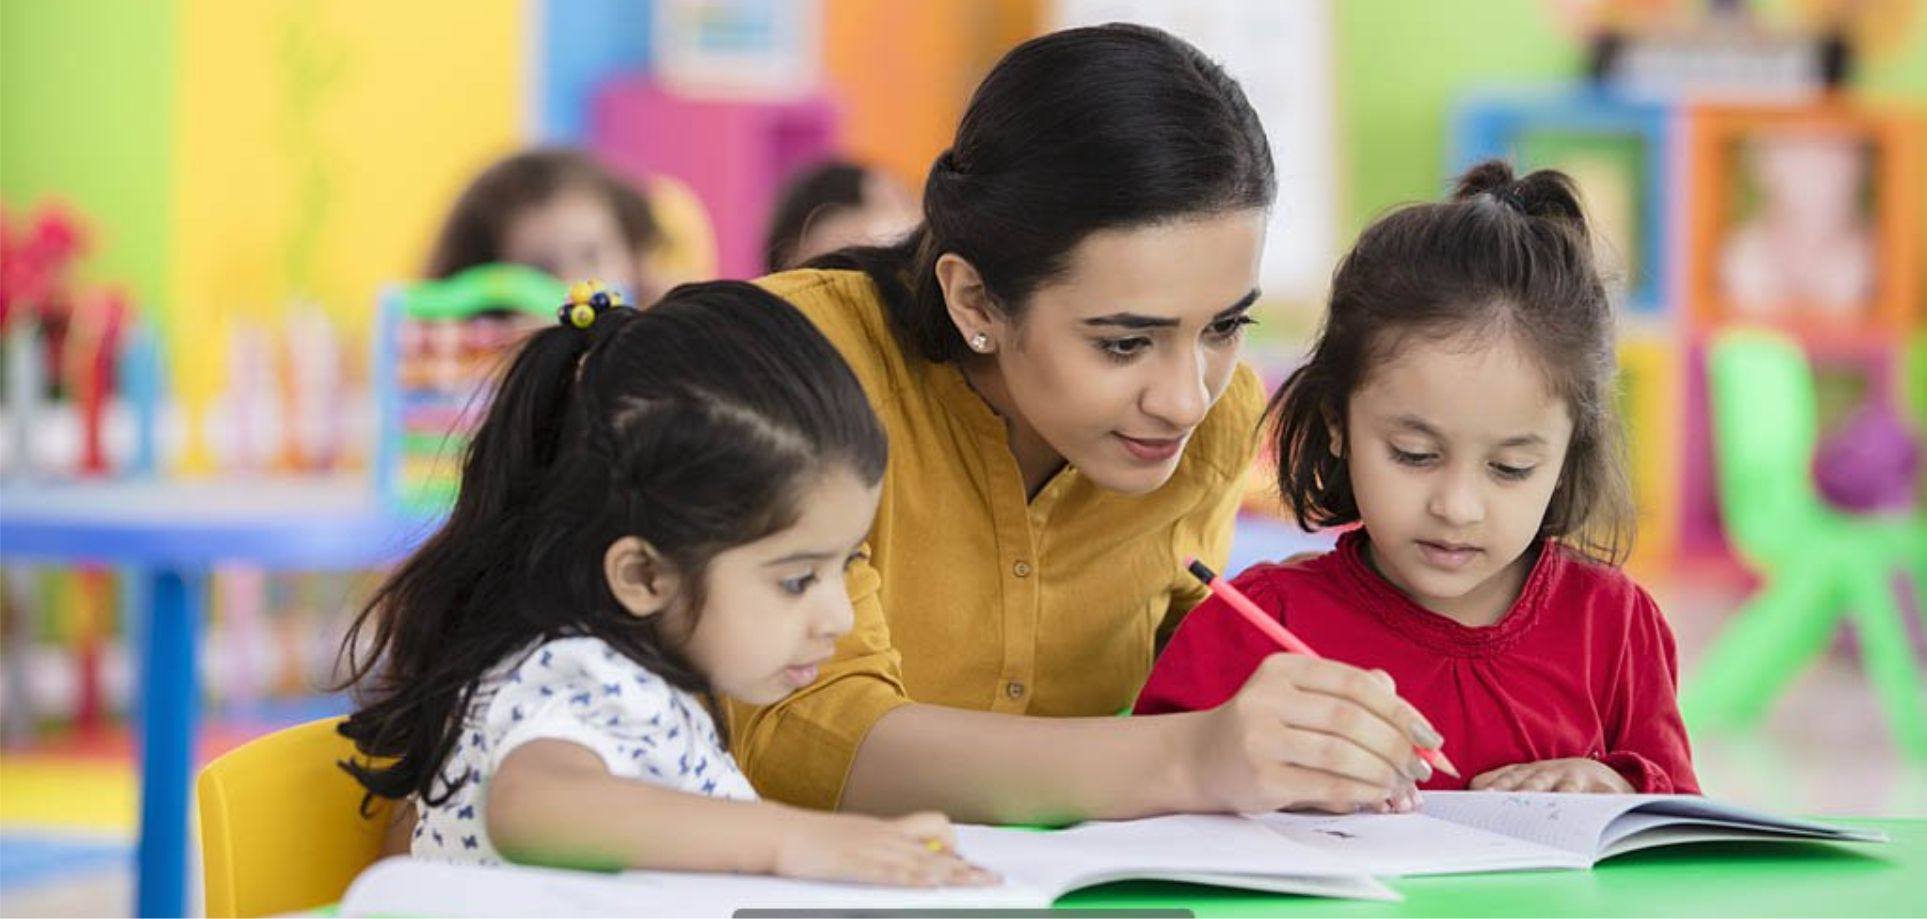 Find best home tutors near you home tutors tutor tuition